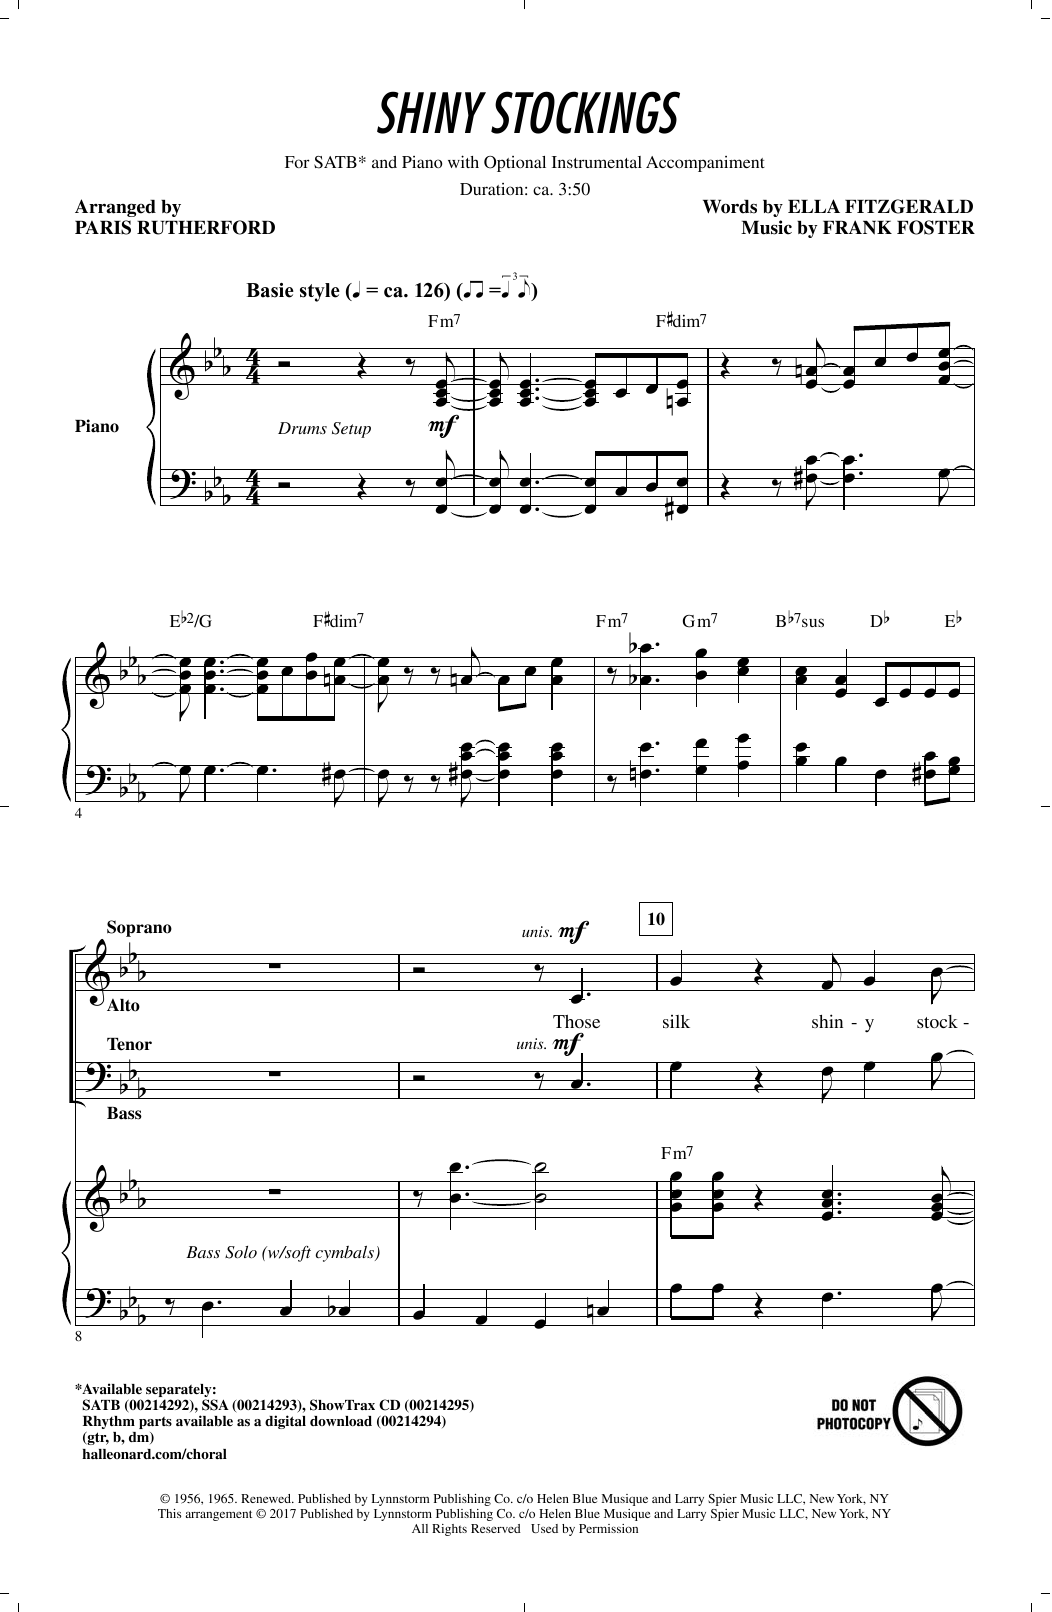 Shiny Stockings (SATB Choir)